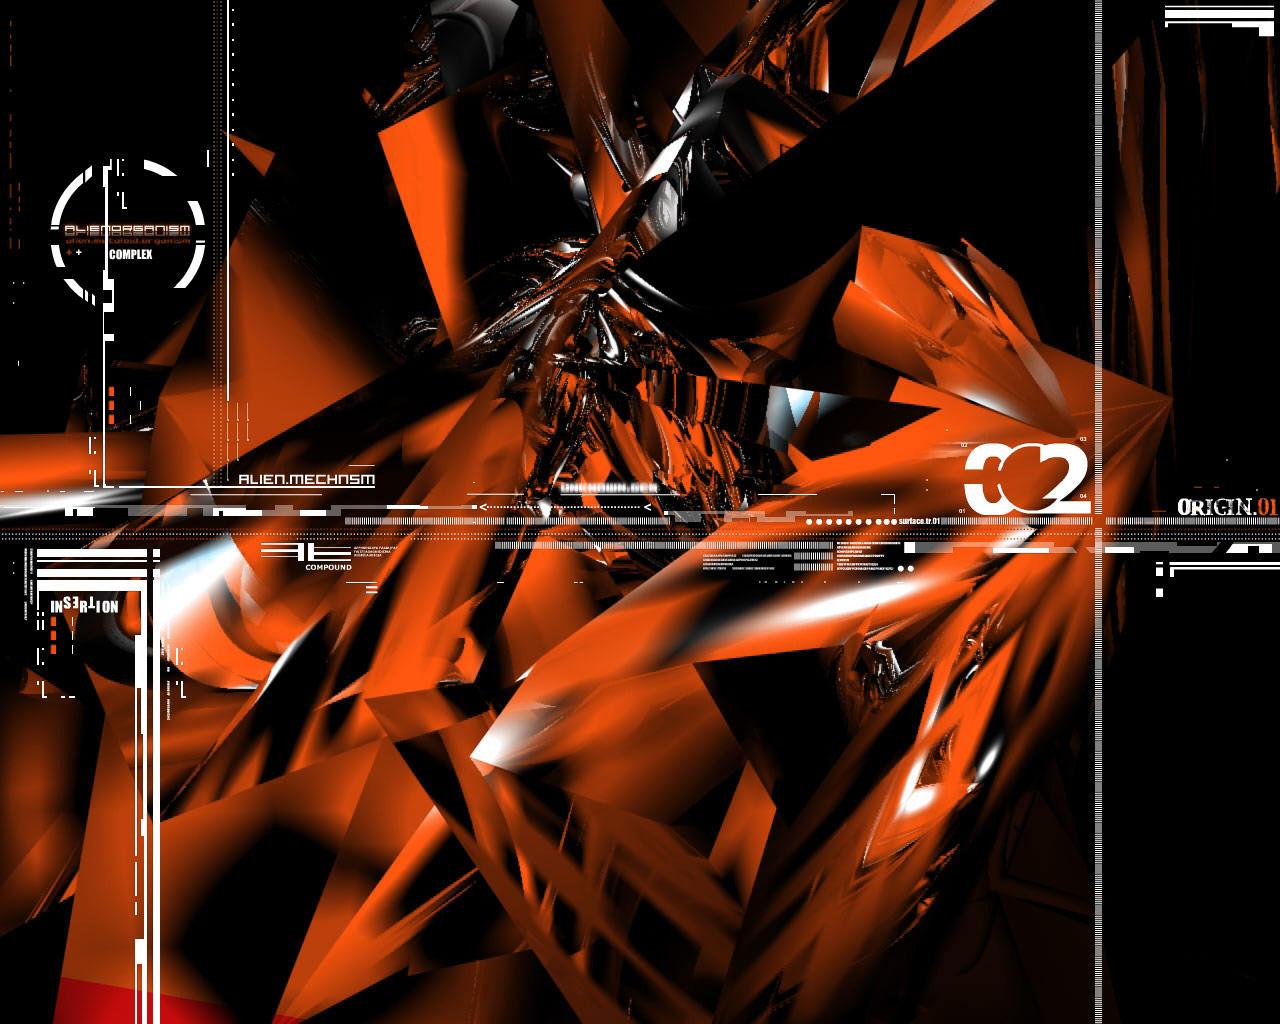 AlienOrgansm Mechnsm V2 by technics